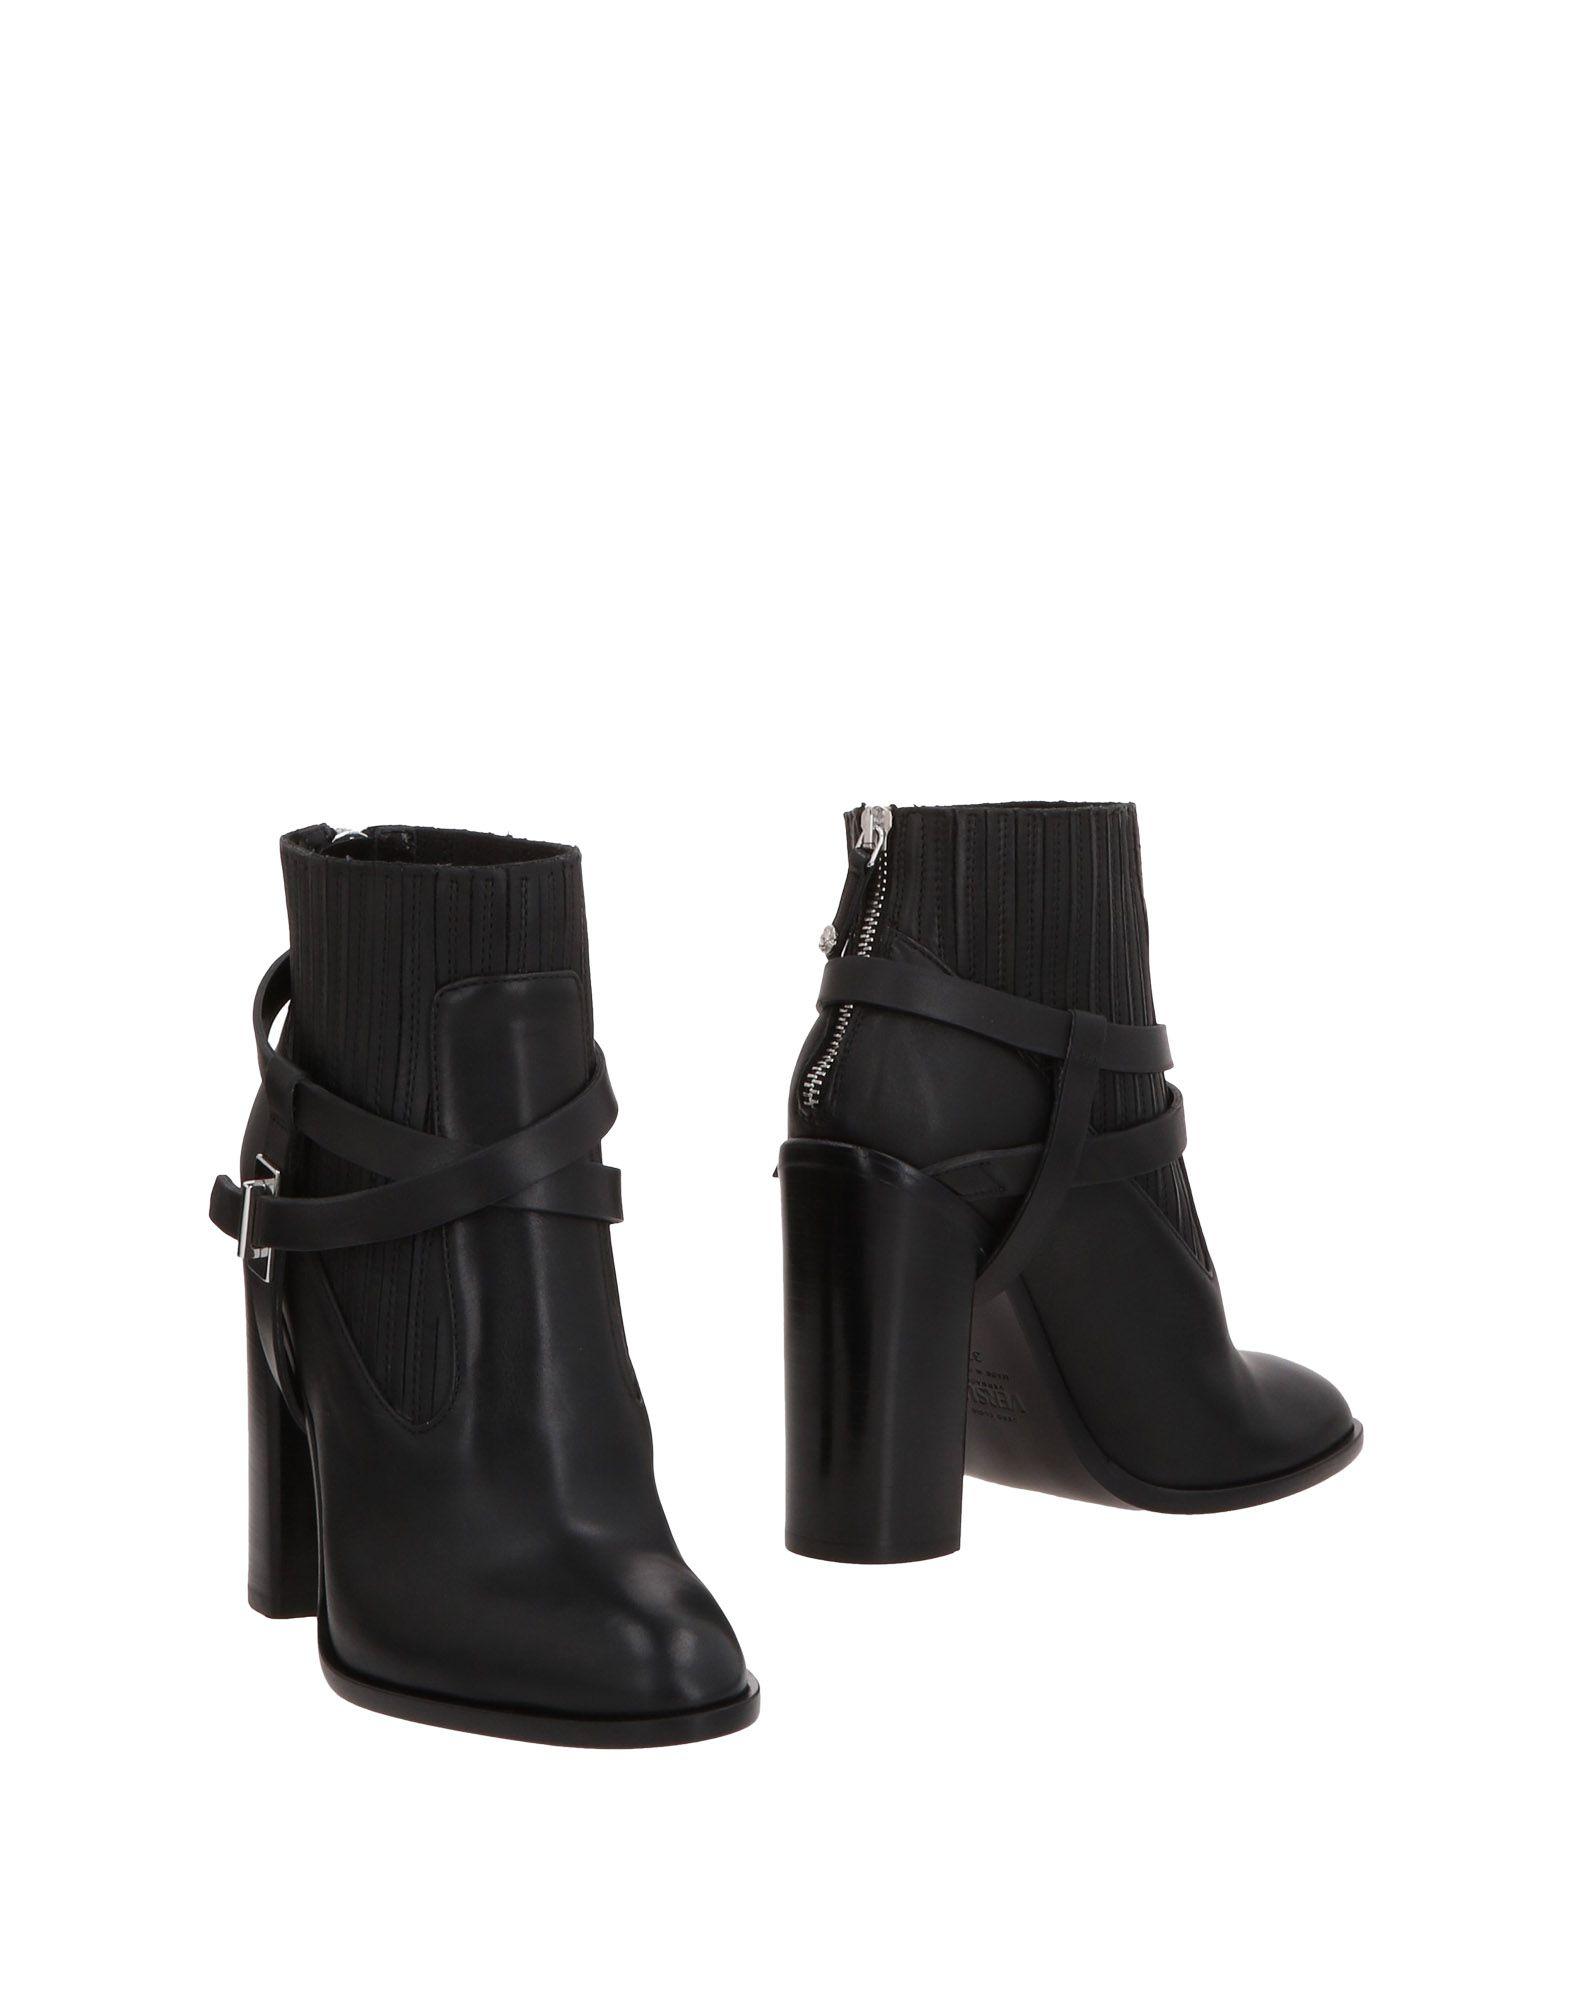 Versus Versace Ankle Boot - Women Versus Versace  Ankle Boots online on  Versace Australia - 11474228RQ 7e6d31